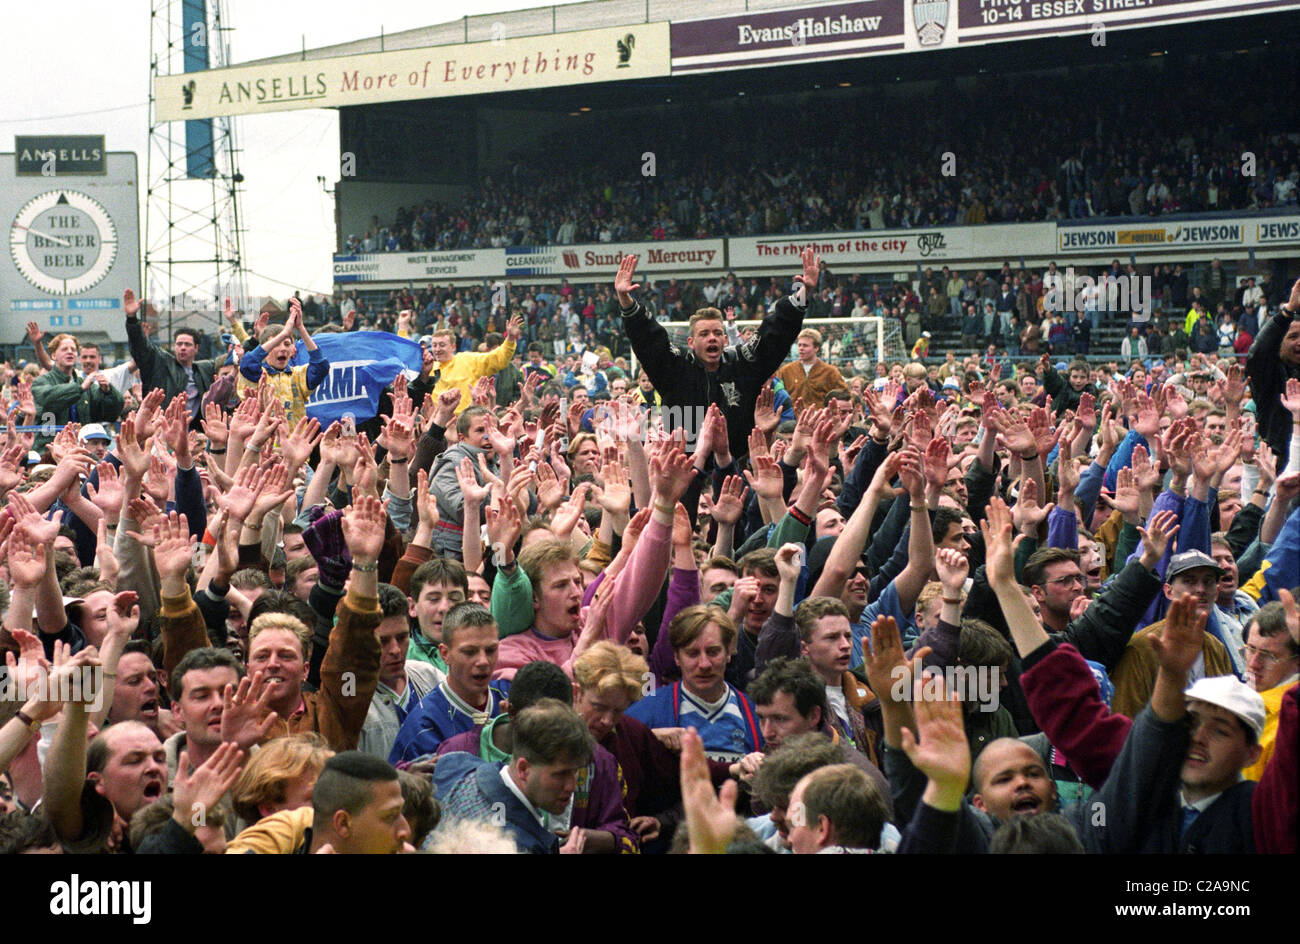 BIRMINGHAM CITY V SHREWSBURY TOWN 25 4 92 1 0 Birmingham Fans Celebrate Promotion